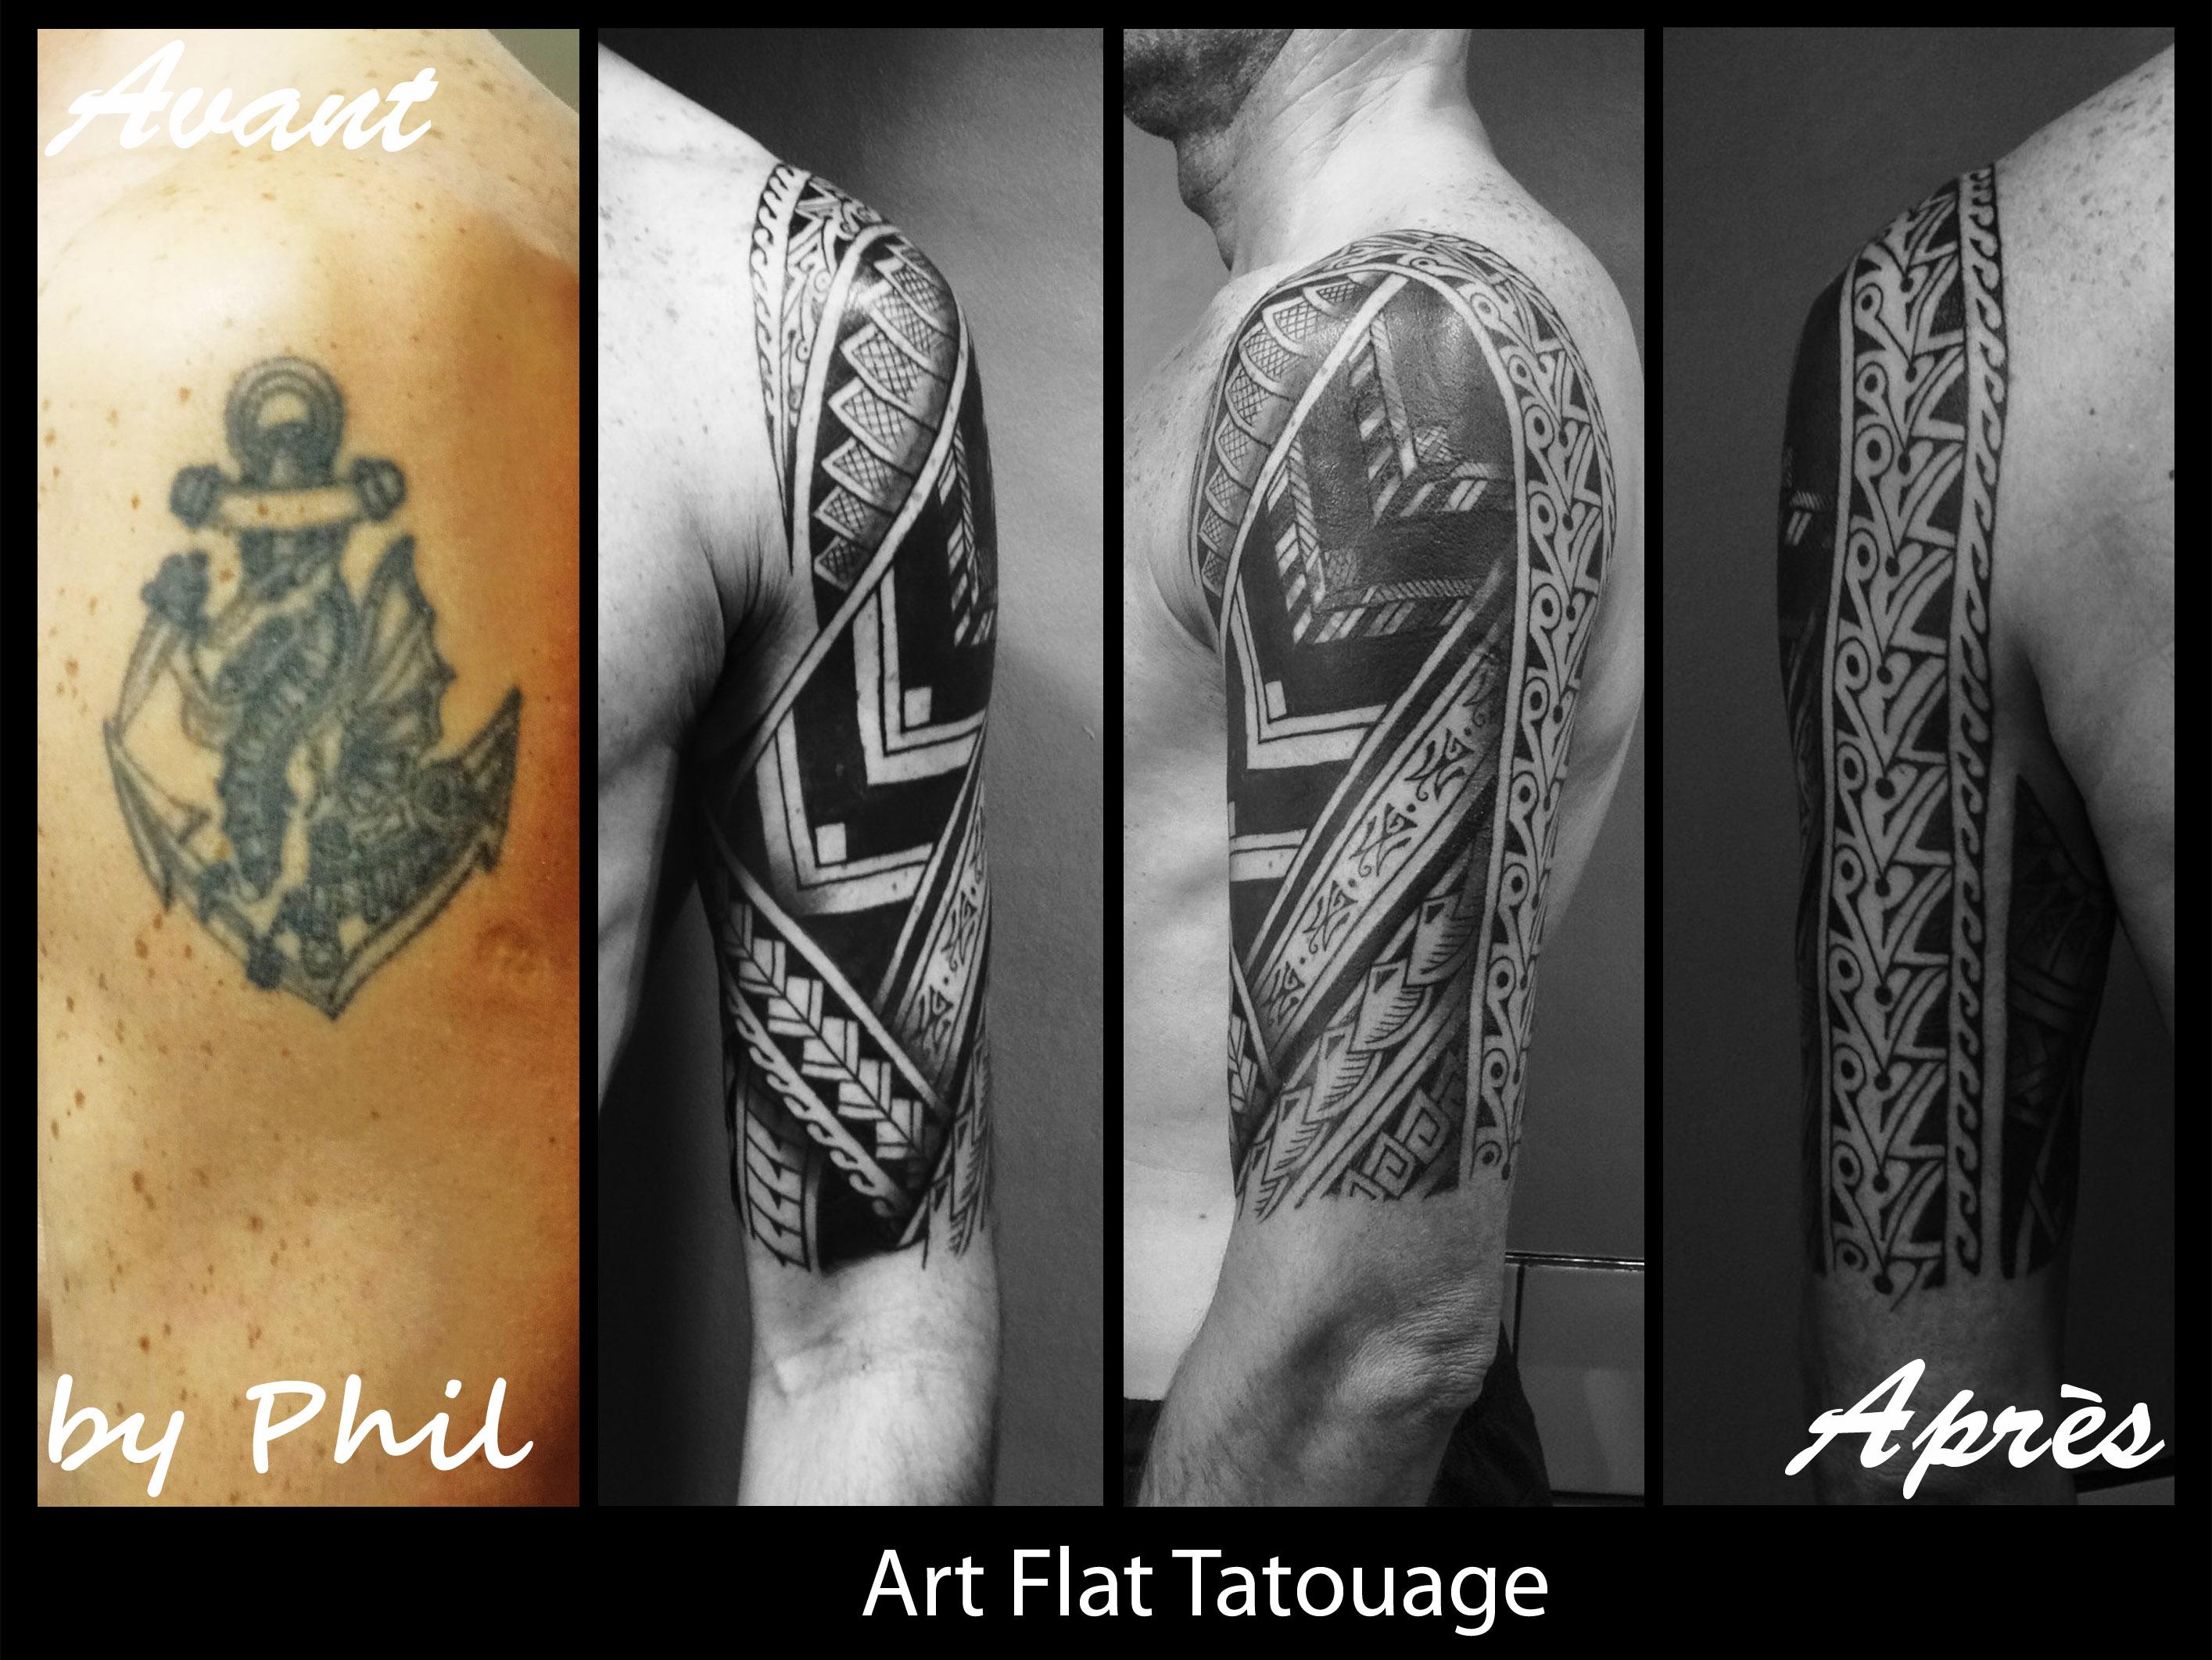 Samoan Homme Art Flat Tatouage